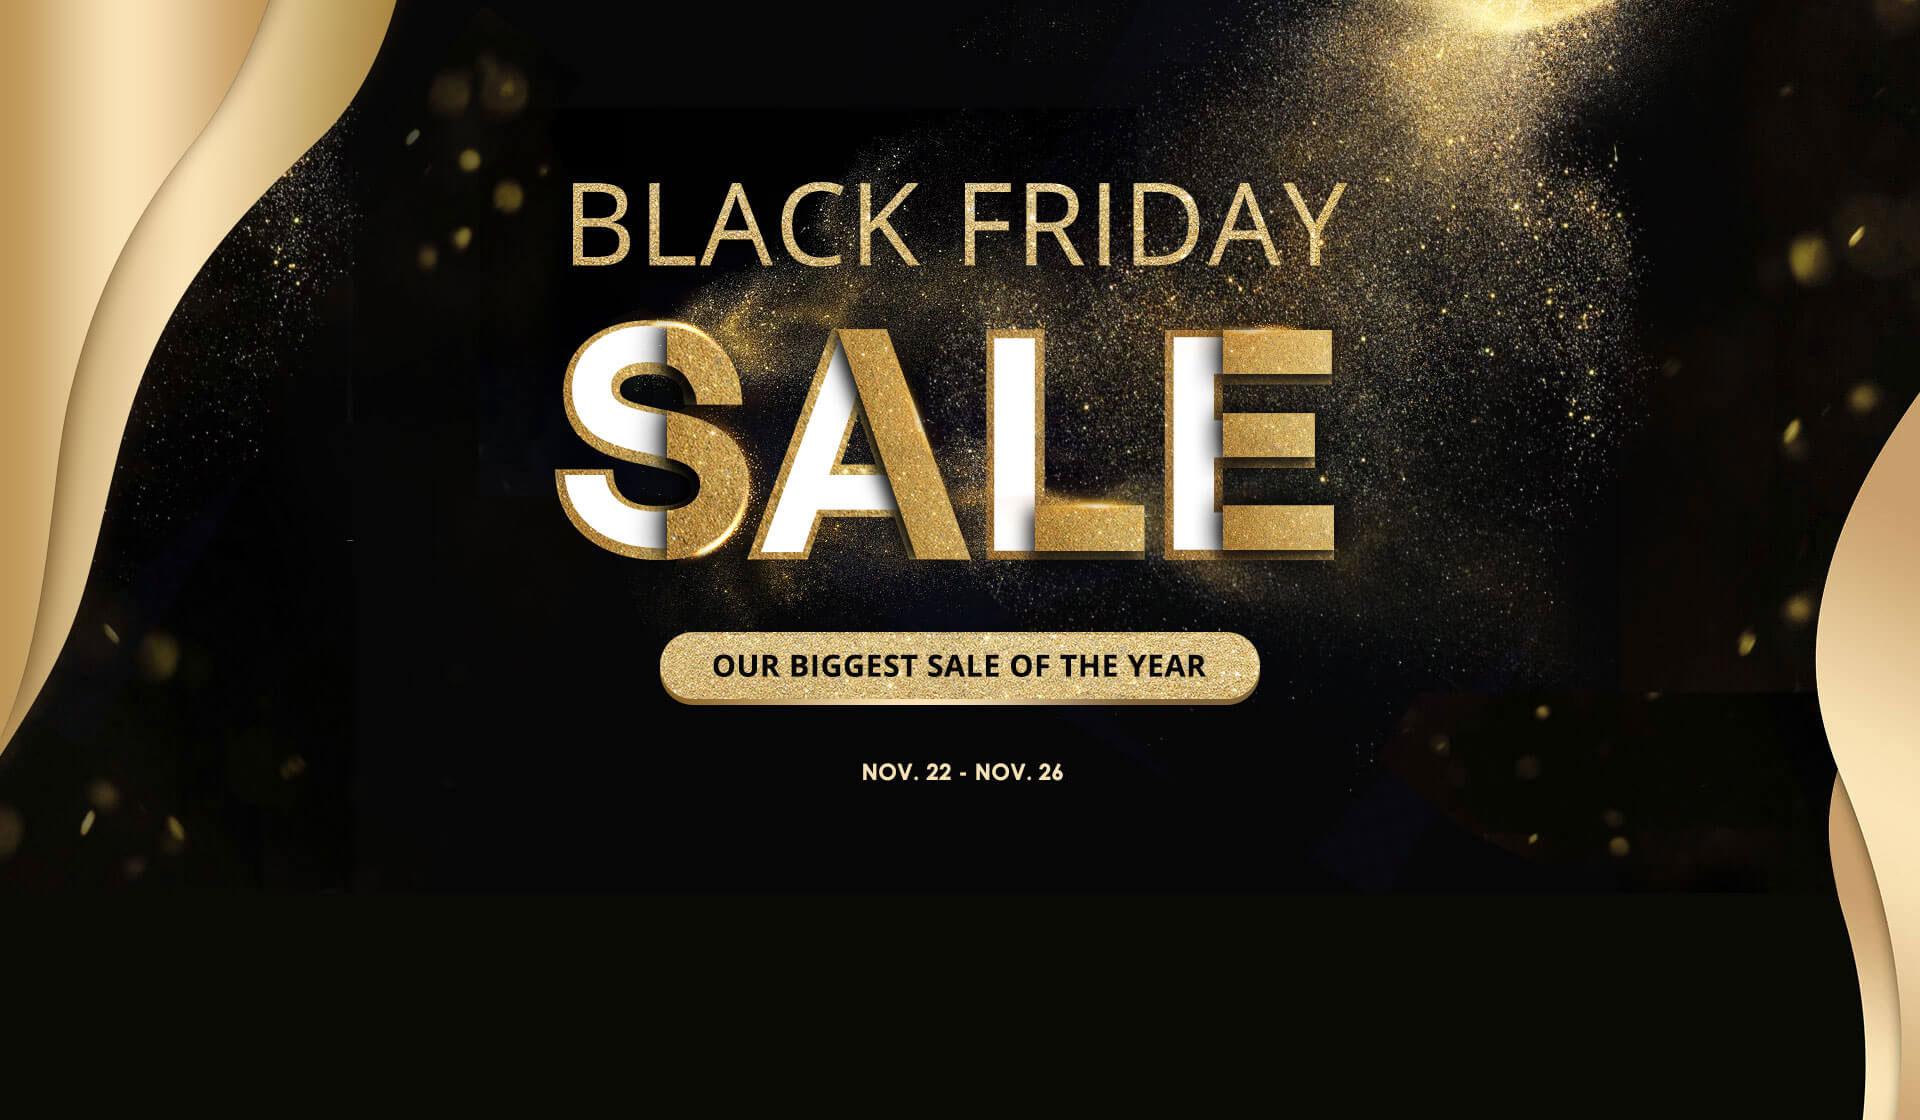 https://css.zafcdn.com/imagecache/ZF_EN/images/pageimg/promotion/black-friday-2017/top-banner.jpg